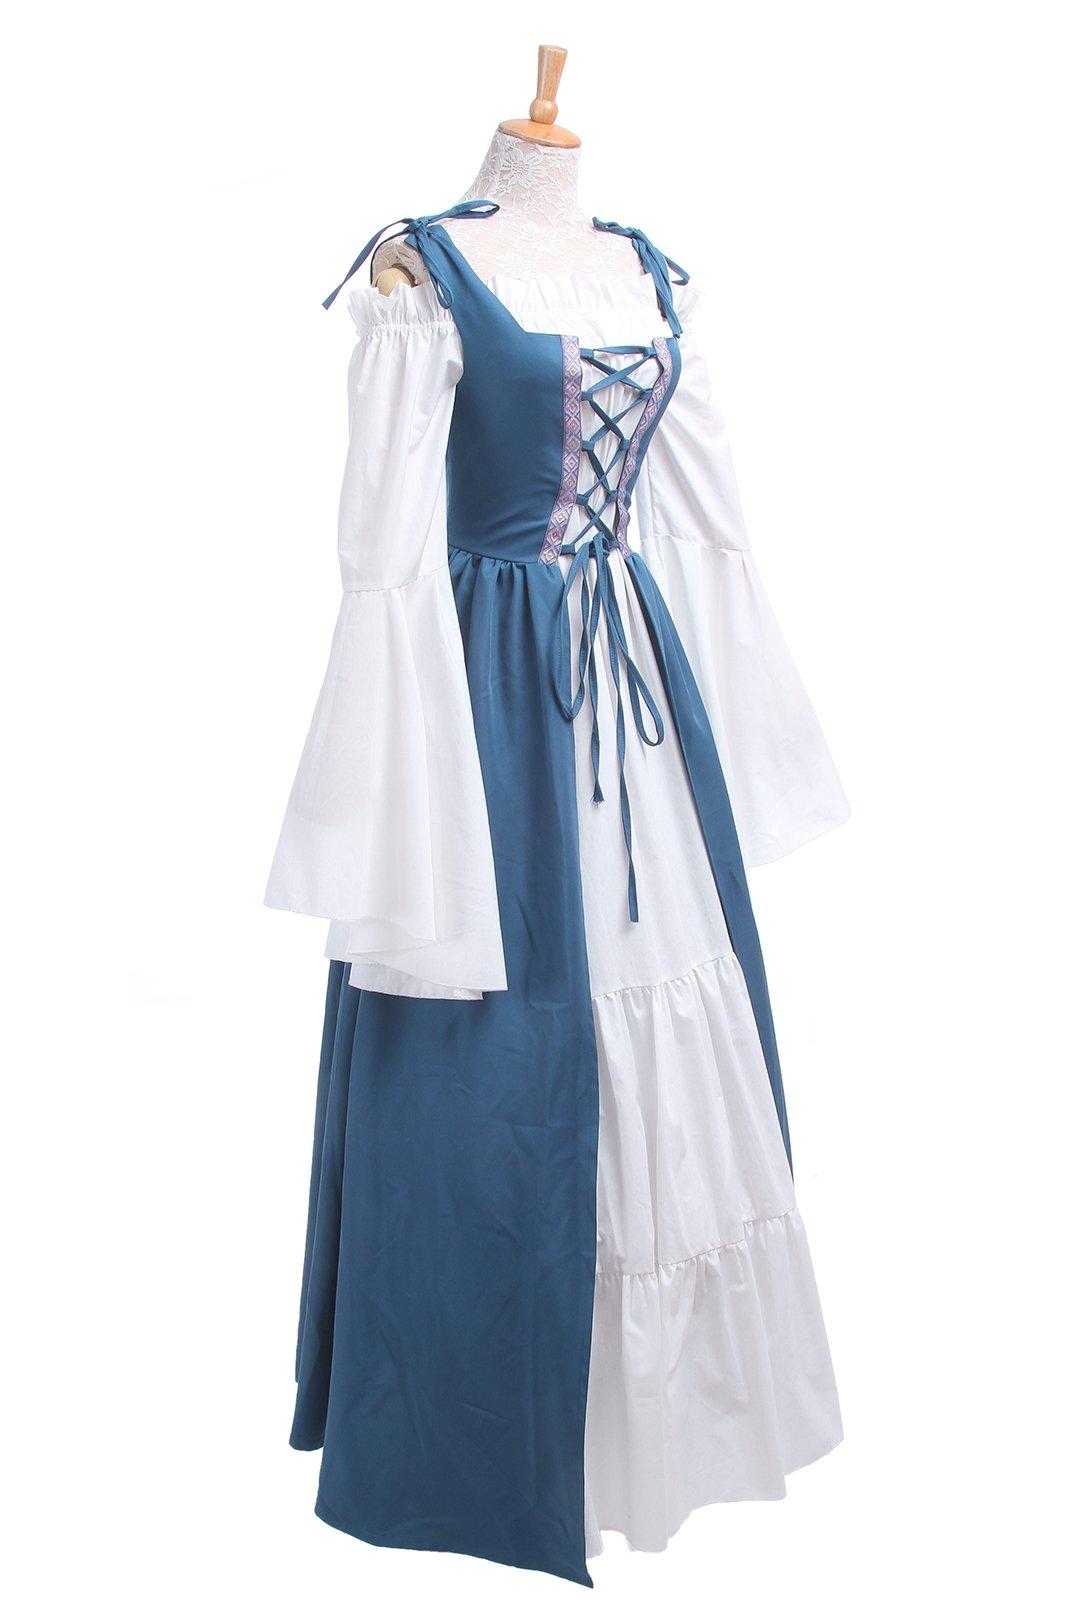 ROLECOS Womens Renaissance Medieval Irish Costume Boho Underdress Overdress Coat Light Blue L by ROLECOS (Image #6)